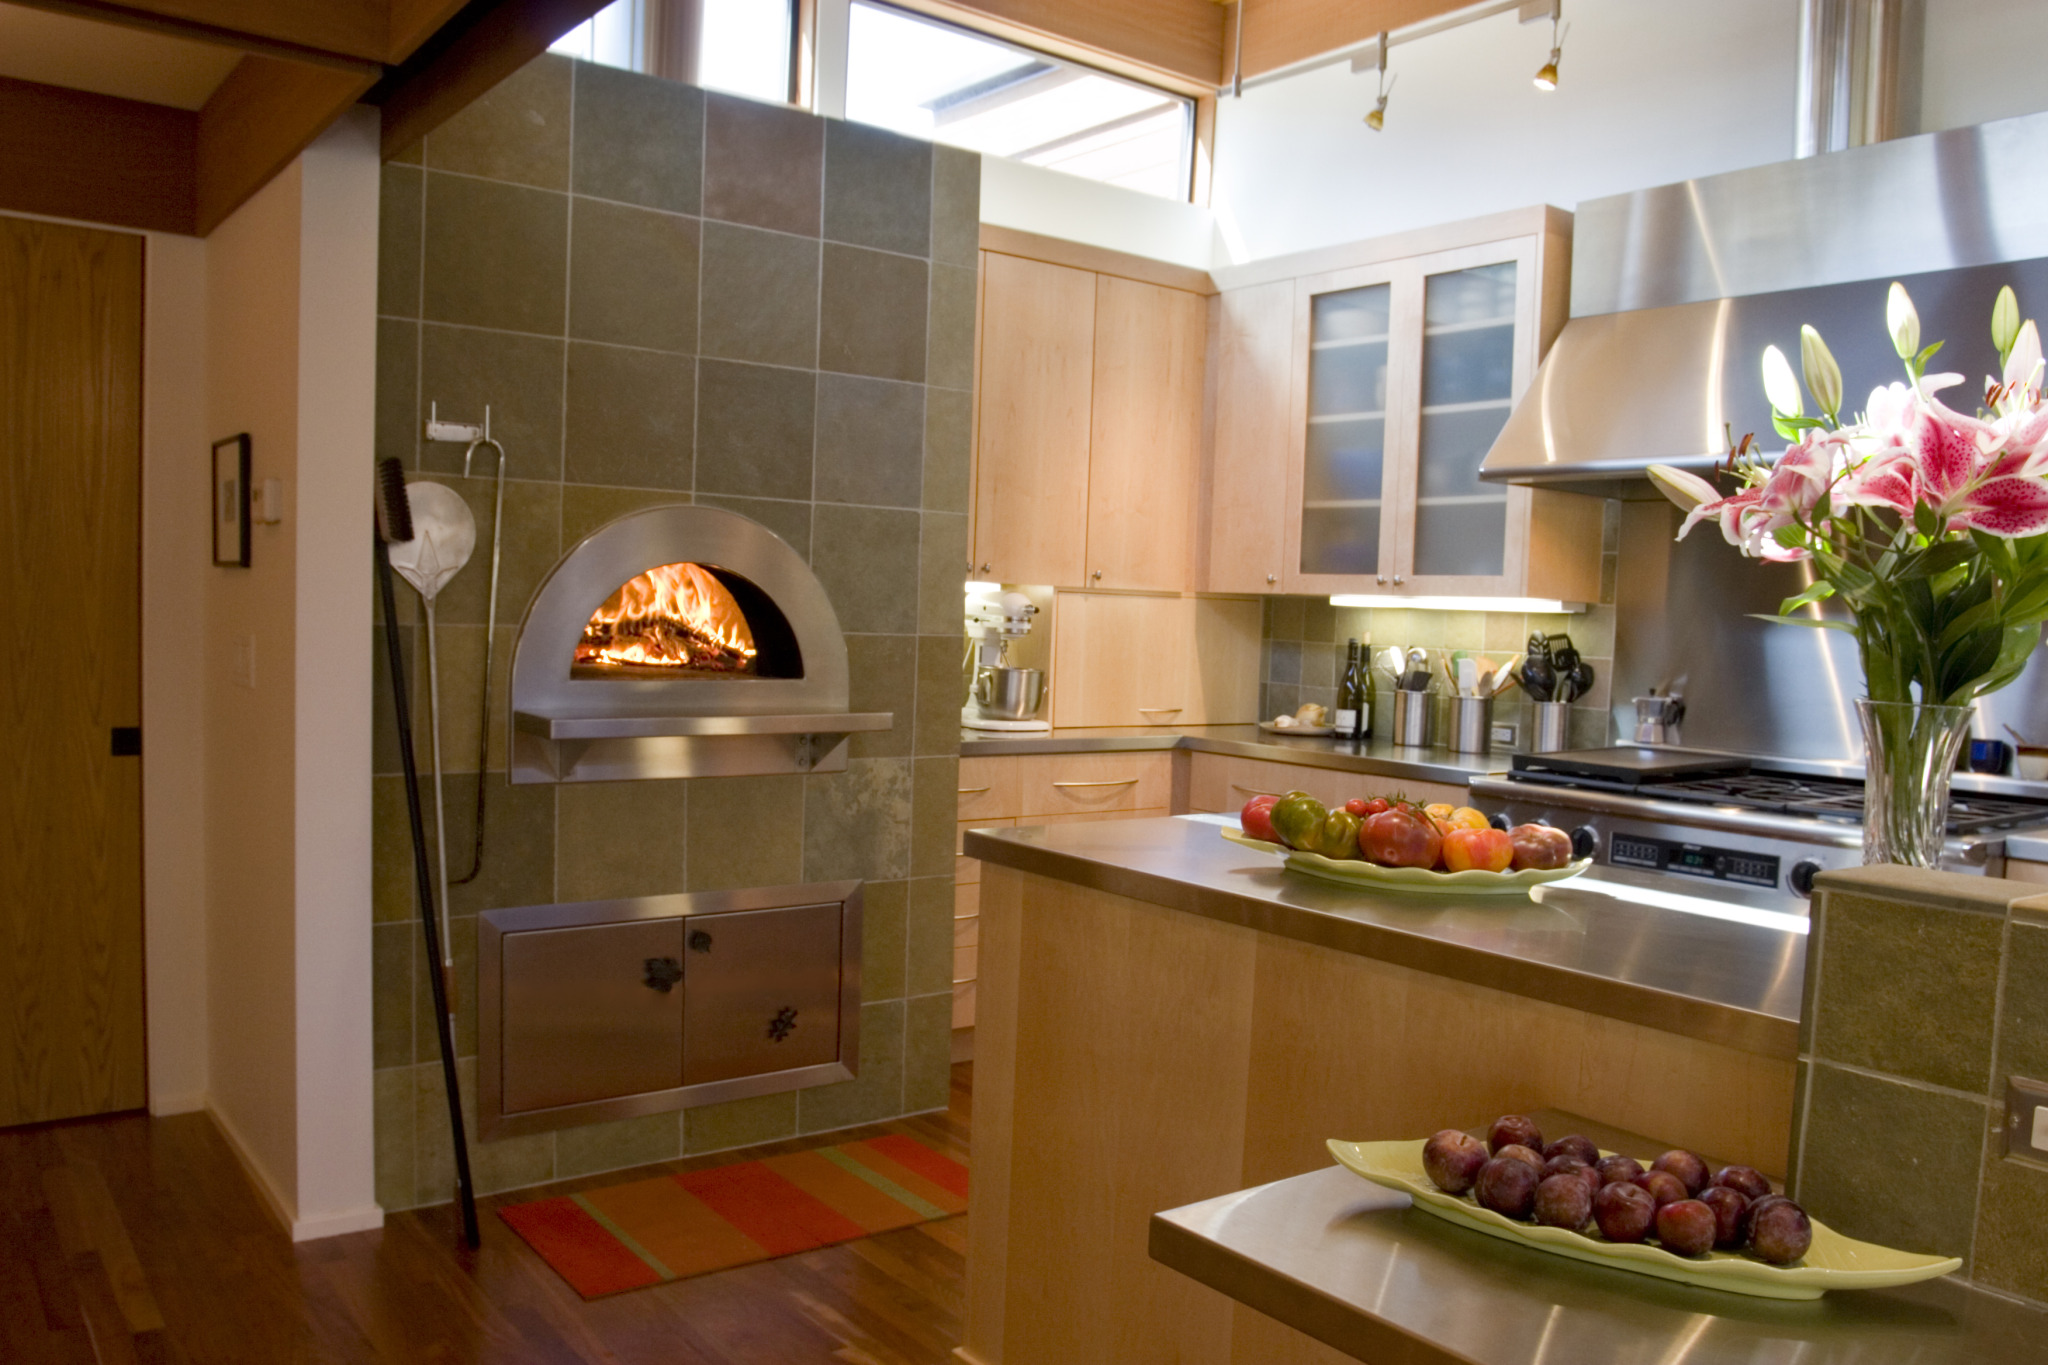 Mugnaini oven in a residential kitchen